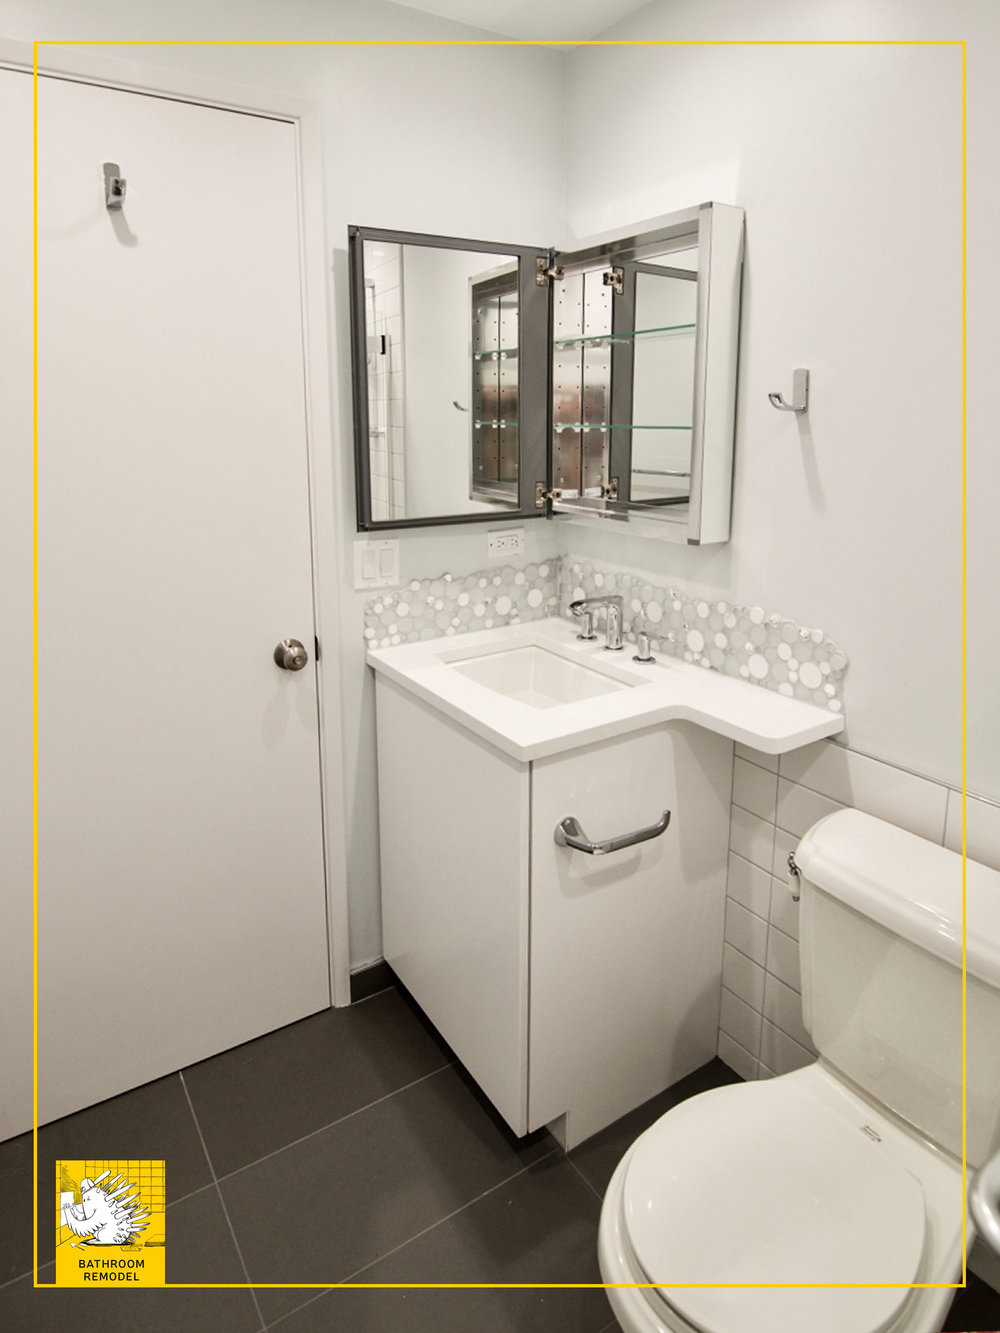 MT bathroom 4 after 3.jpg